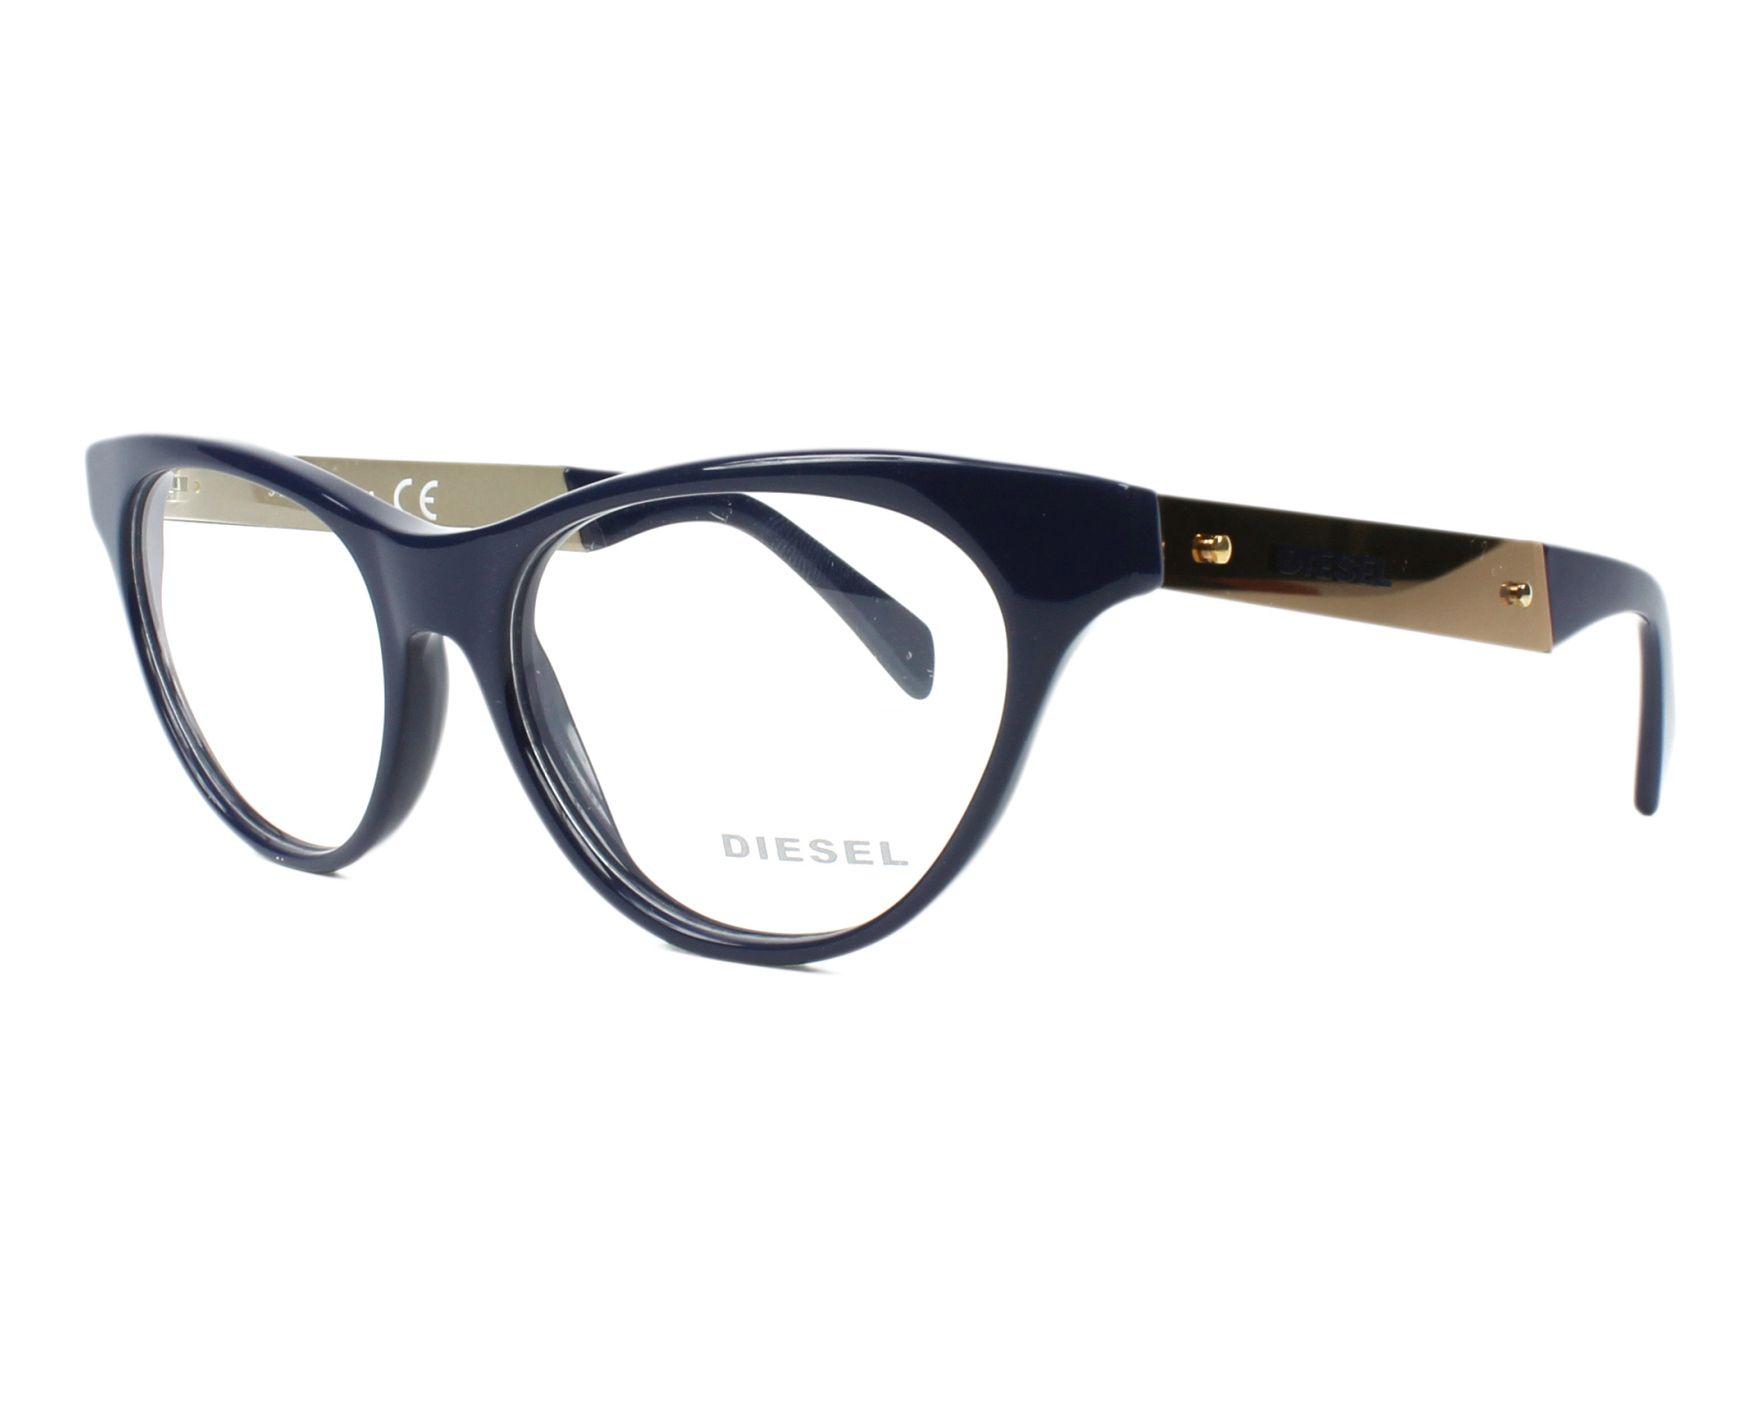 f5fe448b0e7 eyeglasses Diesel DL-5059 090 52-16 Blue Gold profile view